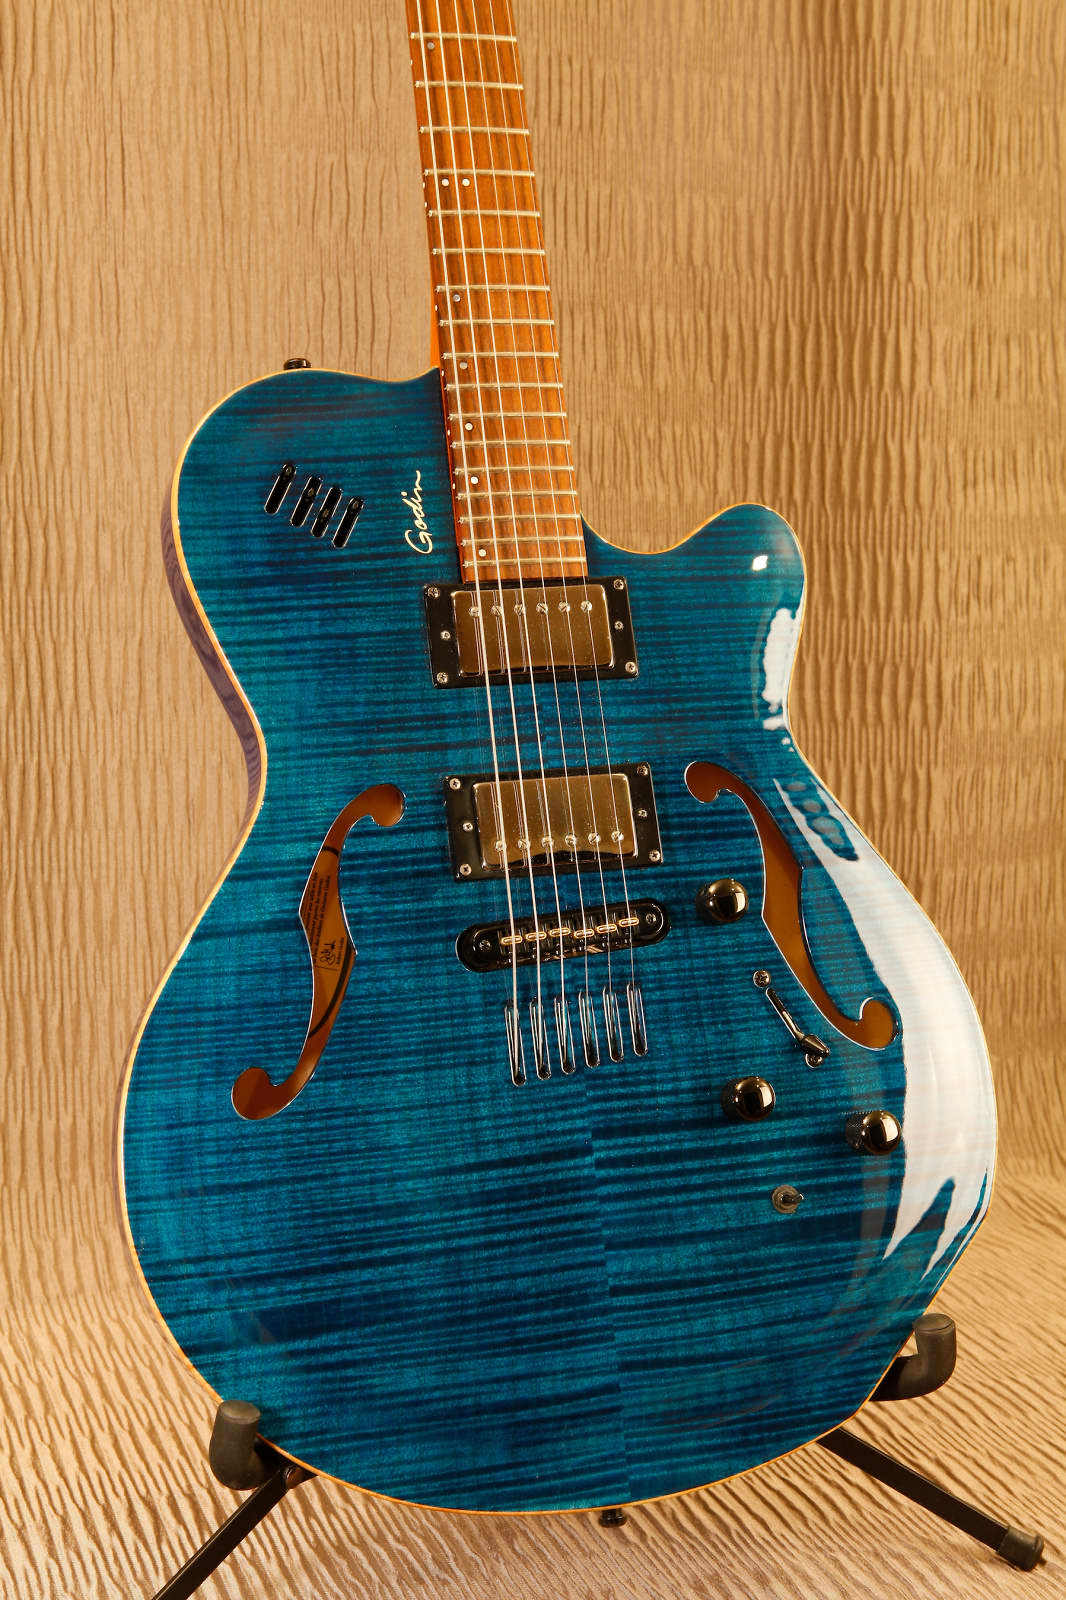 Dings And Dents >> Godin Flat Five X Flat 5 X 2003 Transparent Blue | Reverb